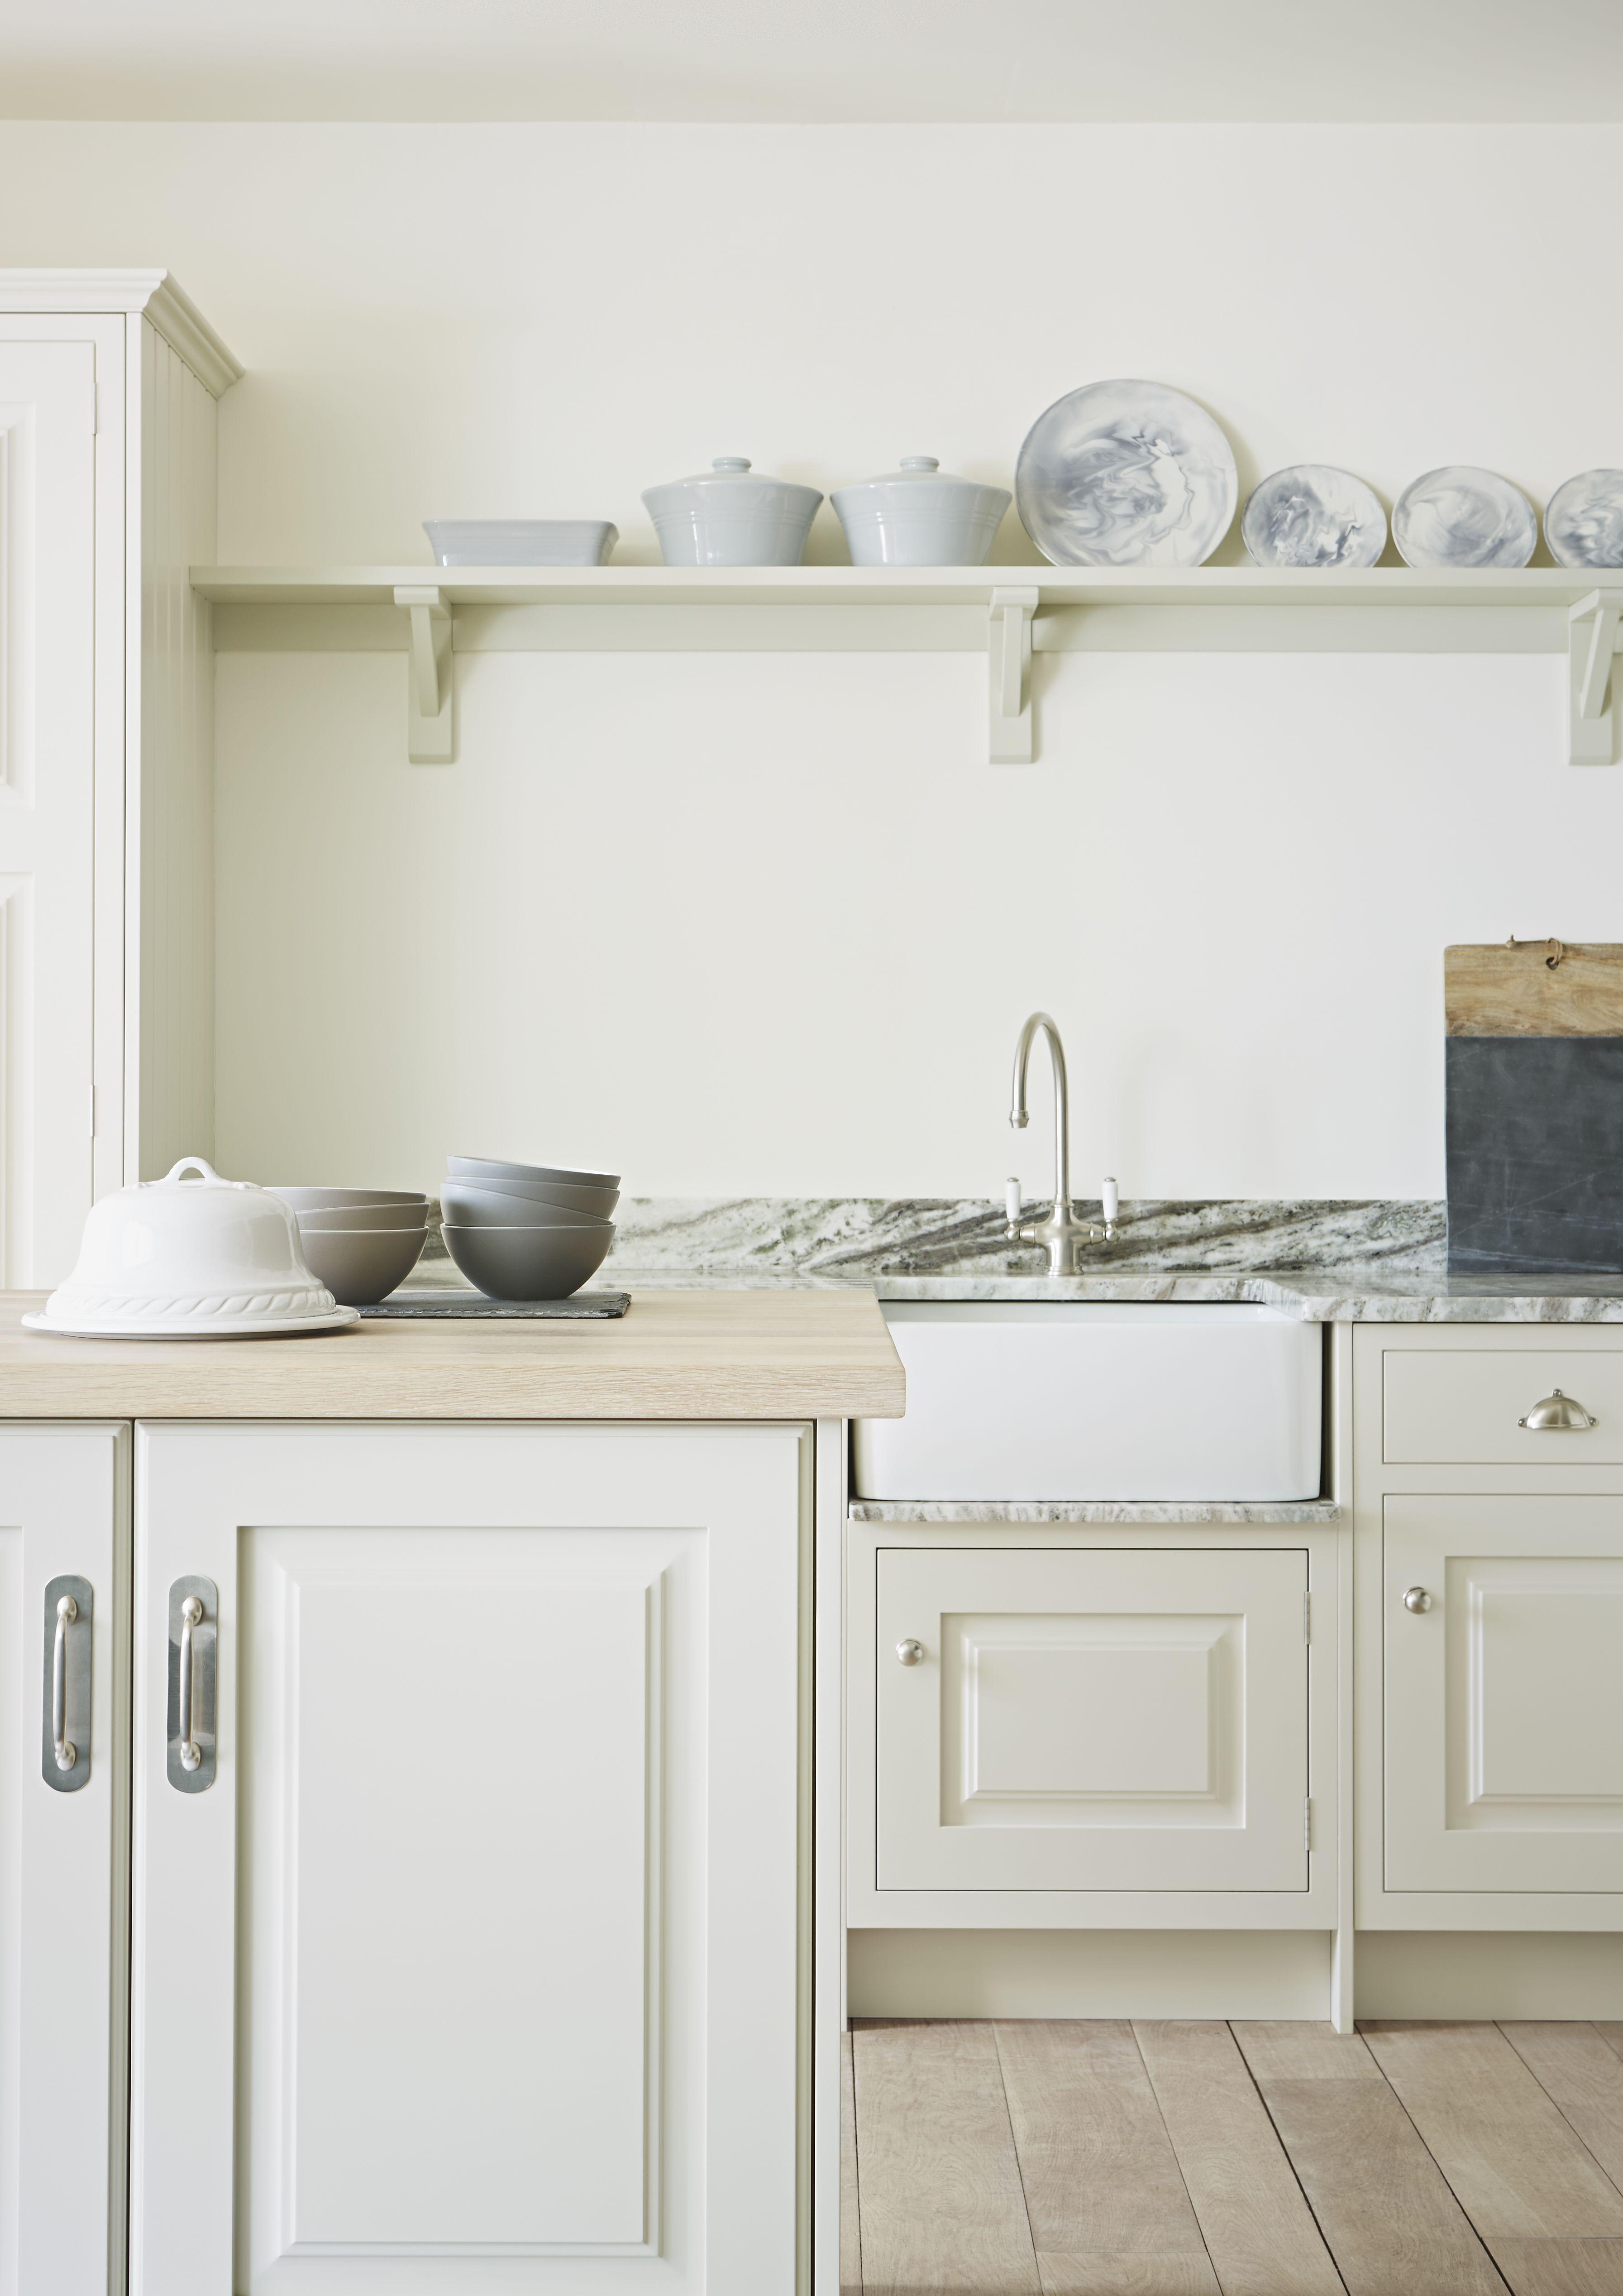 Scandi Style   Artisan Kitchen From John Lewis Of Hungerford. Http://www